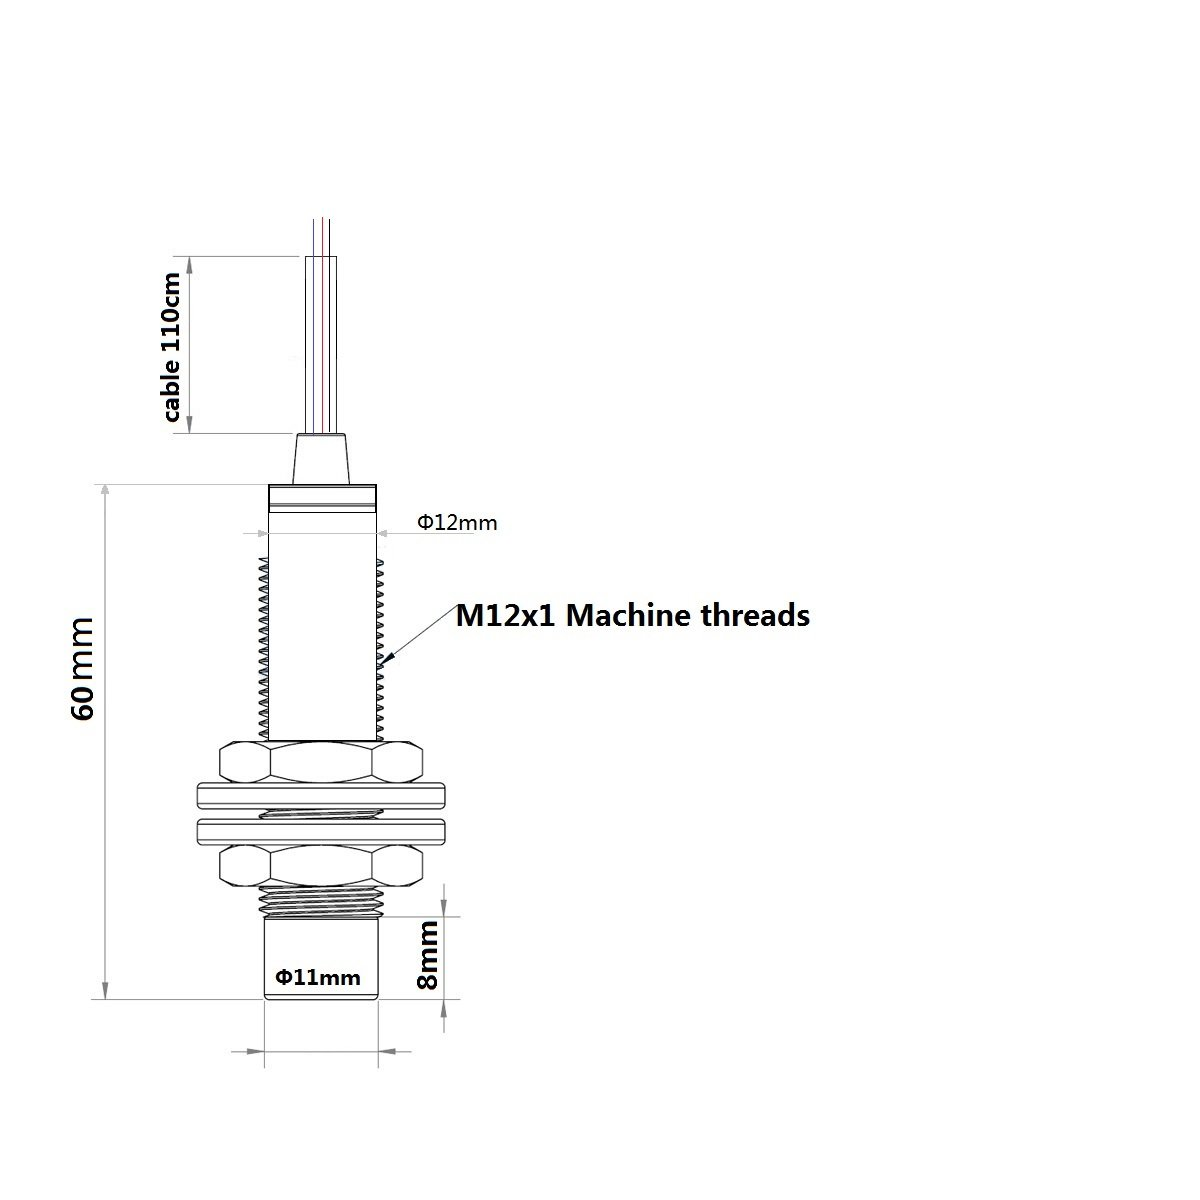 Trigorilla Lj12a3 4 Z Bx Inductive Proximity Sensor Ac Switch Wiring Diagram Npn Dc6 36v 3d Printer Bed Self Adjustment Industrial Scientific